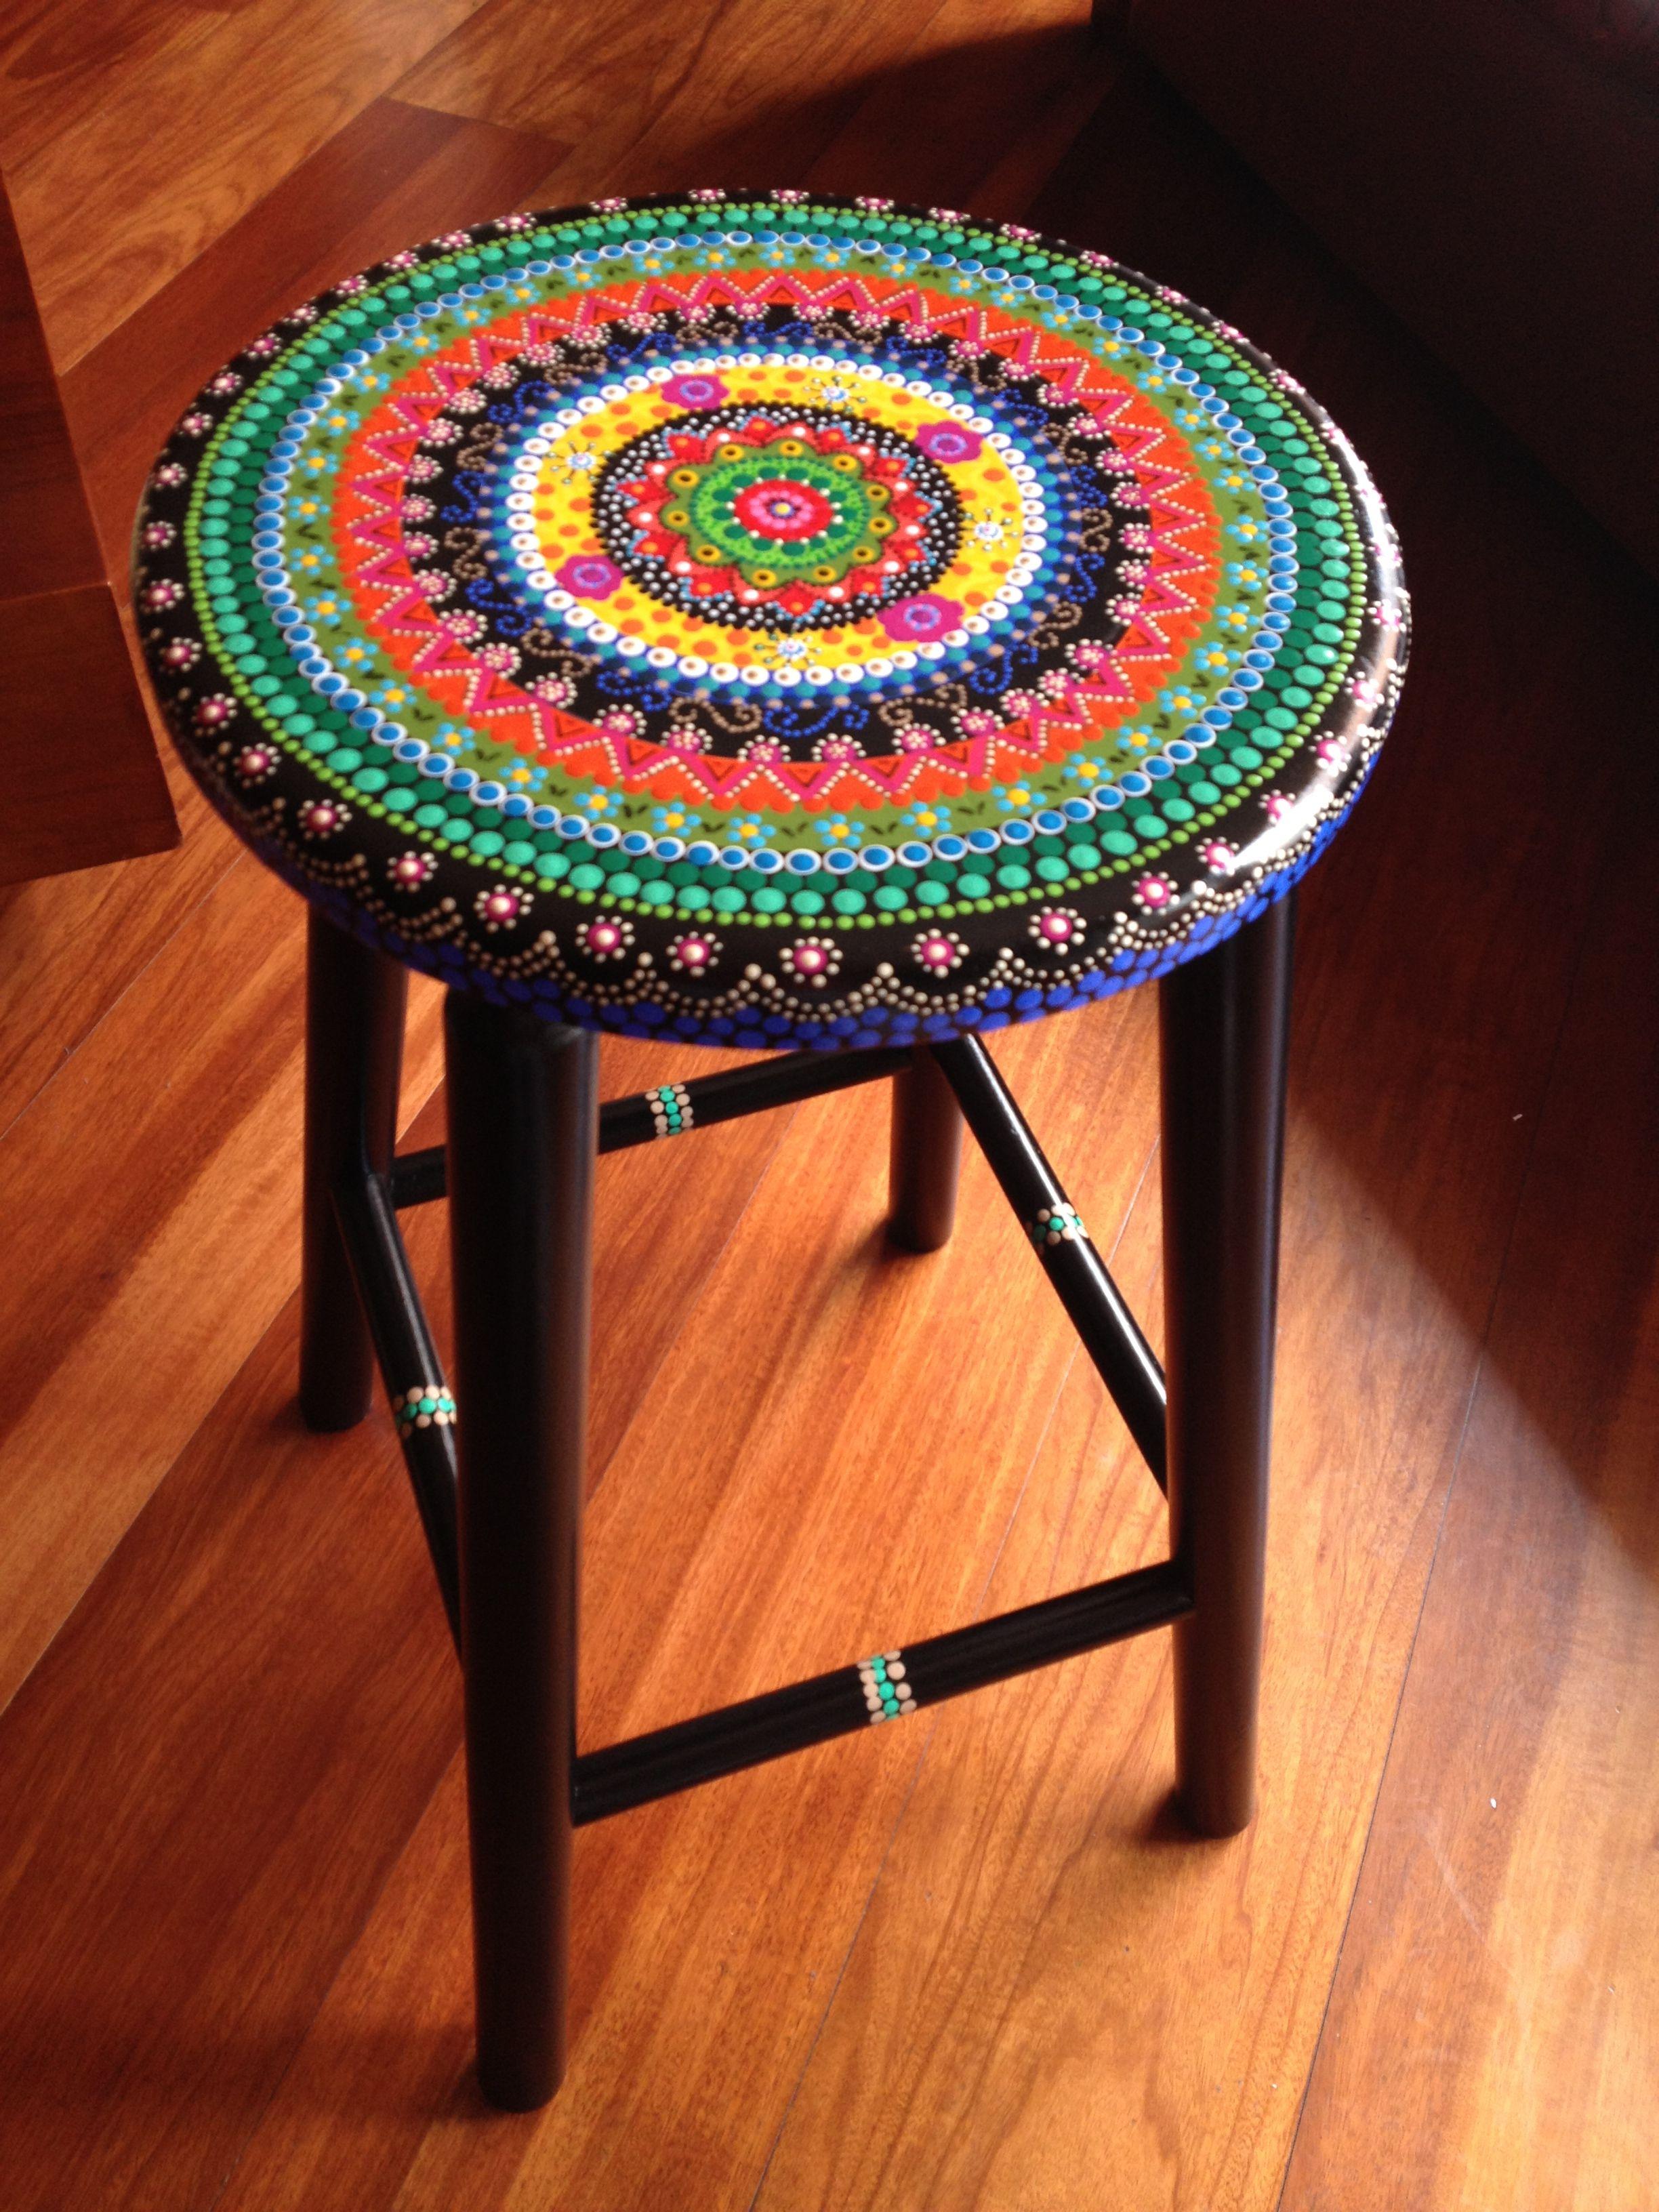 Butacos 60 cm Be Creative Pinterest Paint furniture  : 78b47458f6761cf35f8f9ed8928b9687 from www.pinterest.com.au size 3264 x 2448 jpeg 5122kB